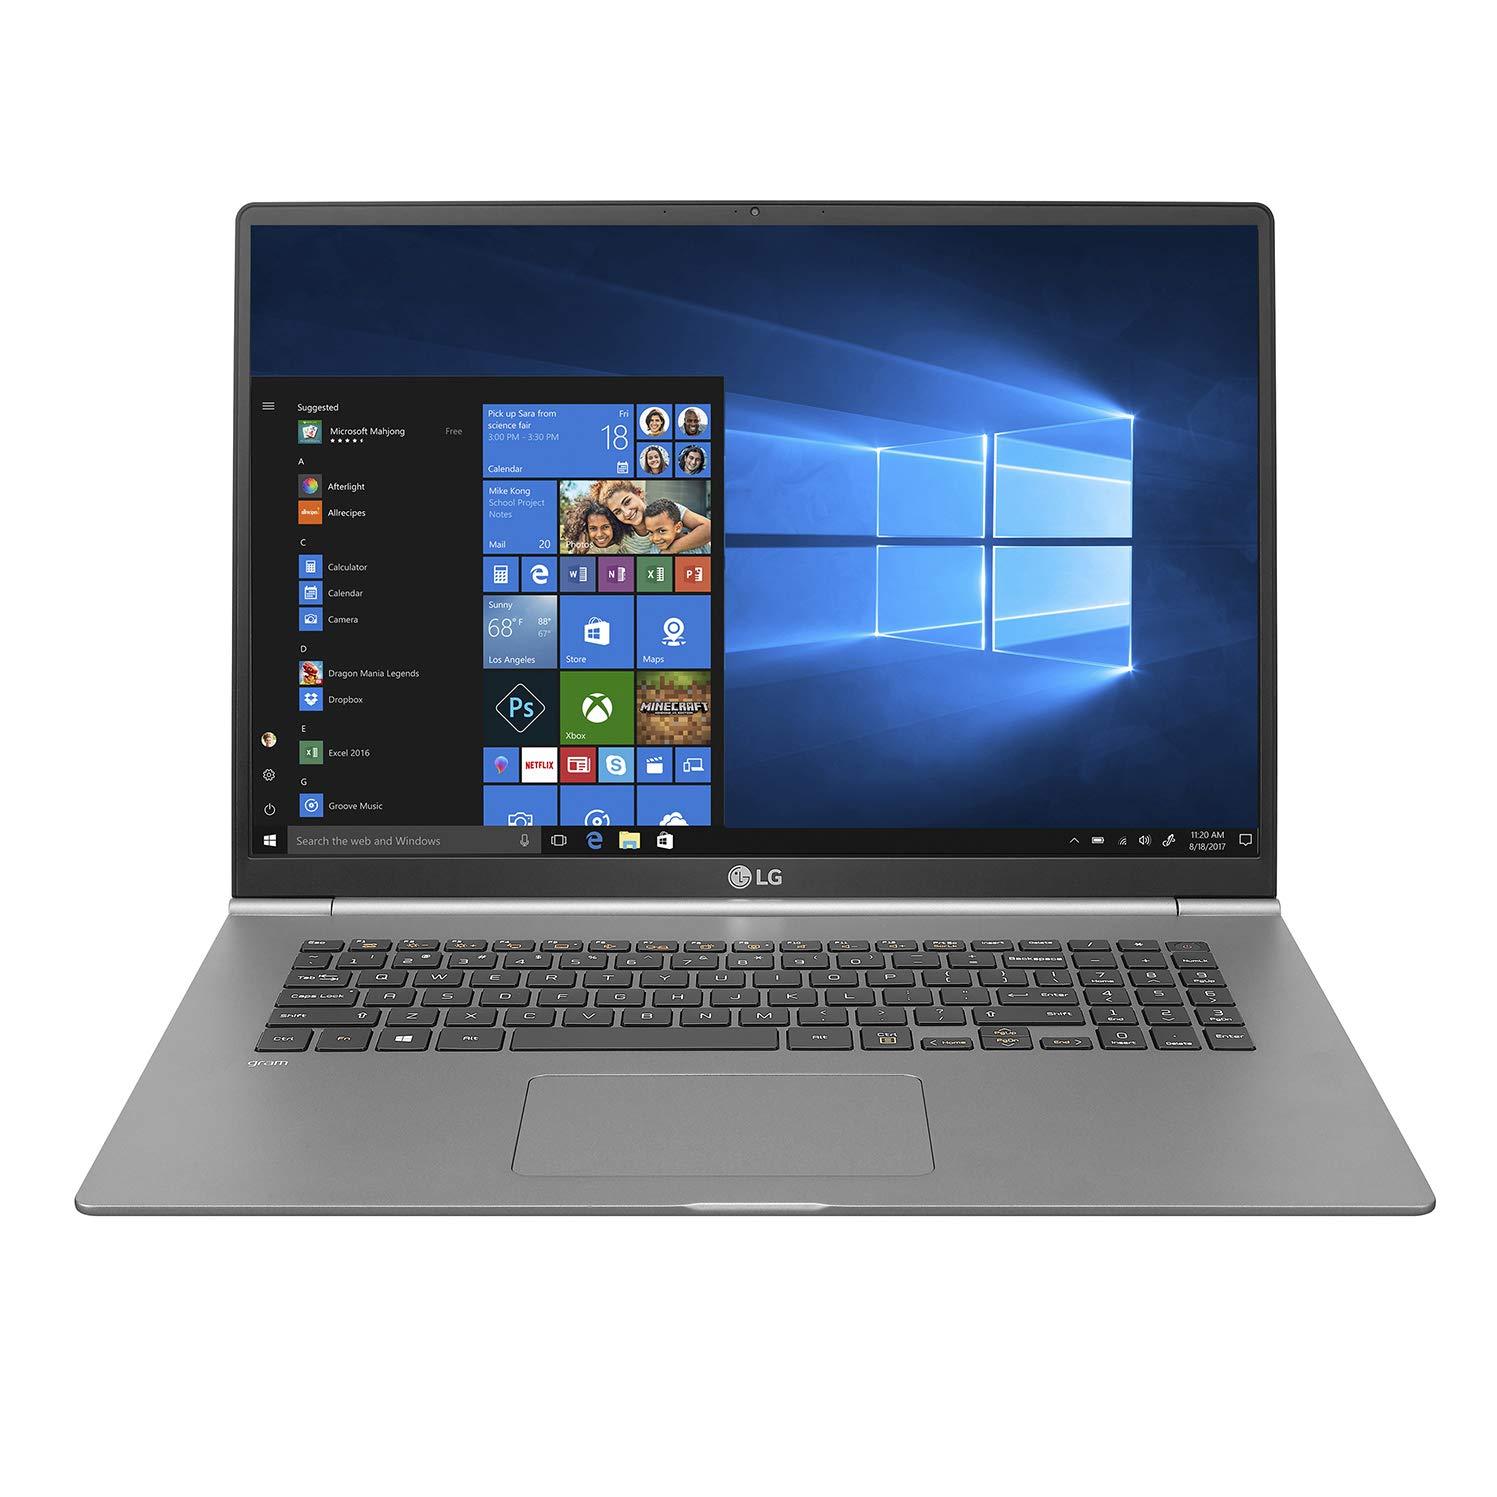 LG gram Thin and Light Laptop - 17''  (2560 x 1600) IPS Display, Intel 8th Gen Core i7, 16GB RAM, 512GB SSD, up to 19.5 Hour Battery, Thunderbolt 3 - 17Z990-R.AAS8U1 (2019), Dark Silver by LG